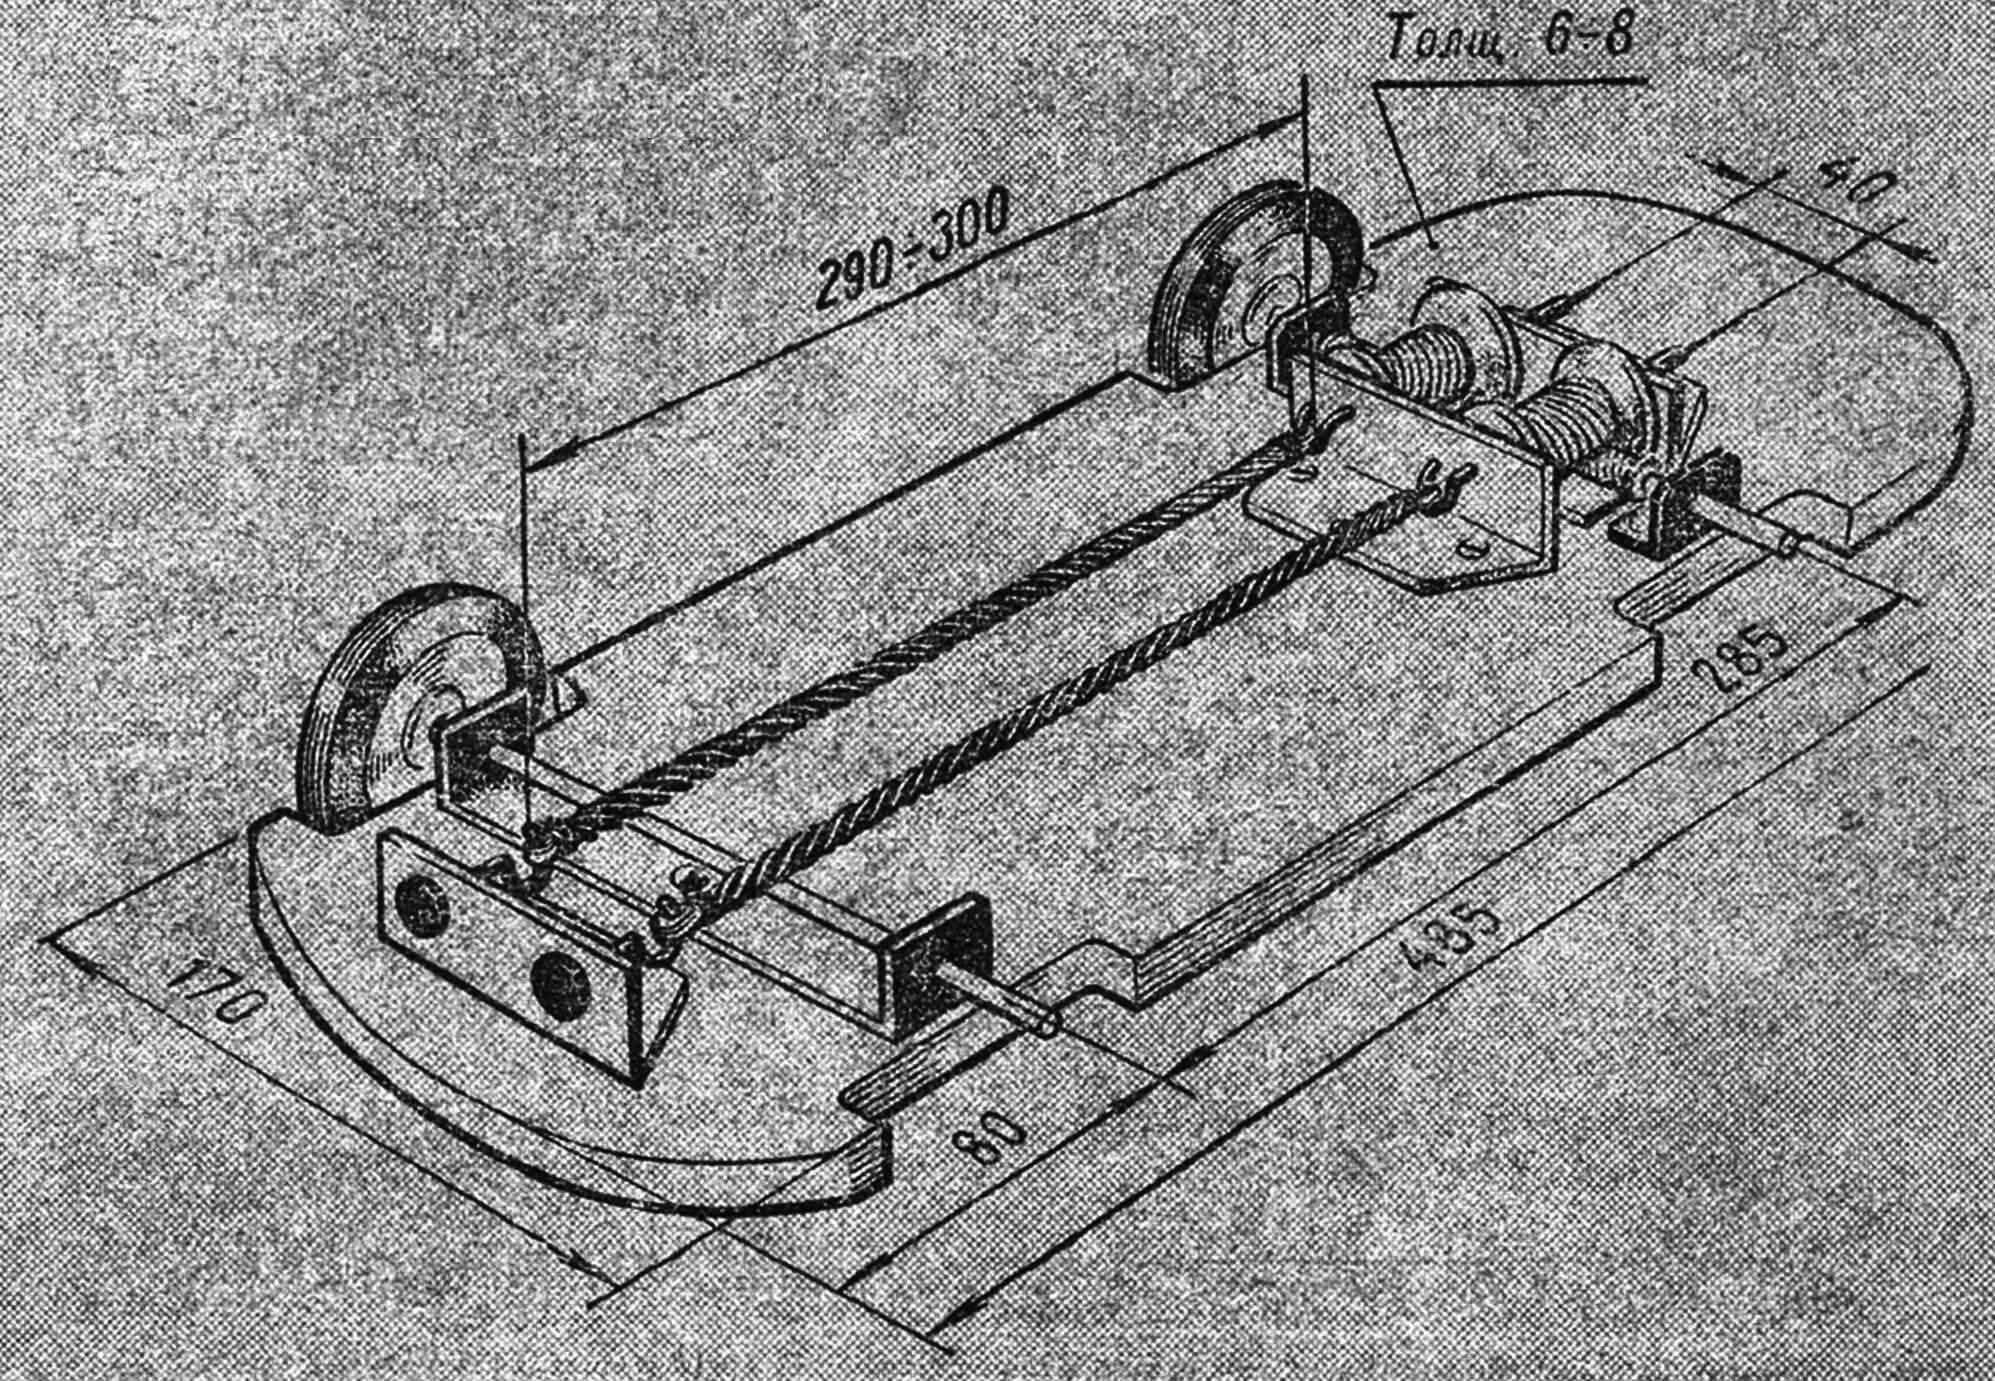 Рама, подвески и устройство резиномотора параллельного типа.